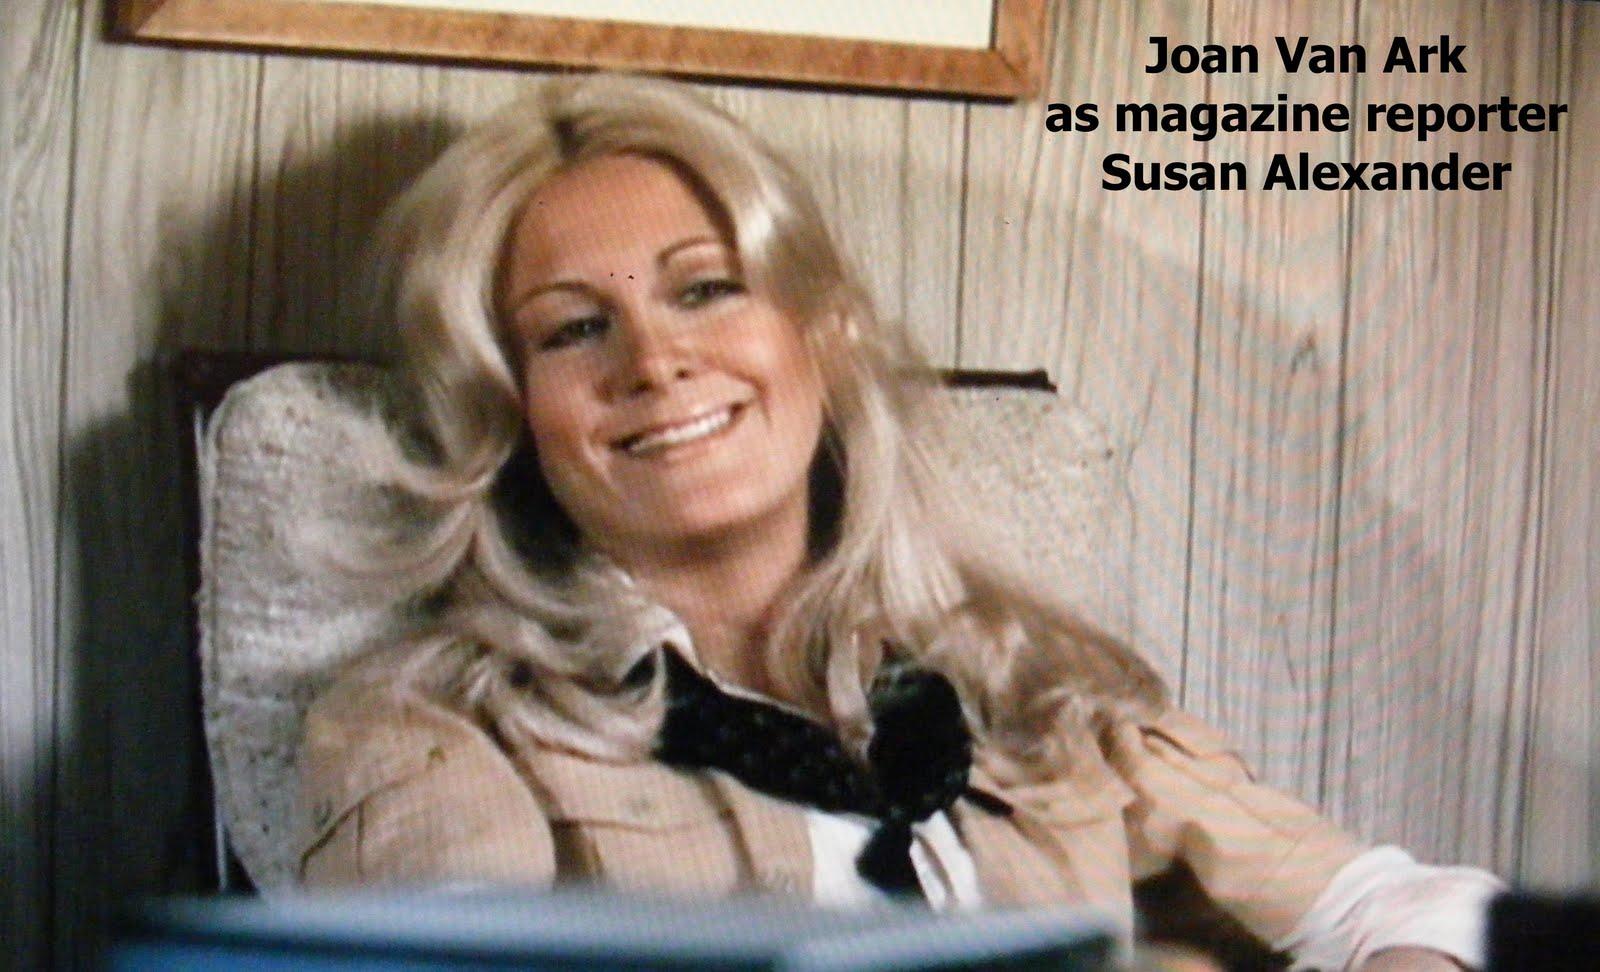 joan van ark husband